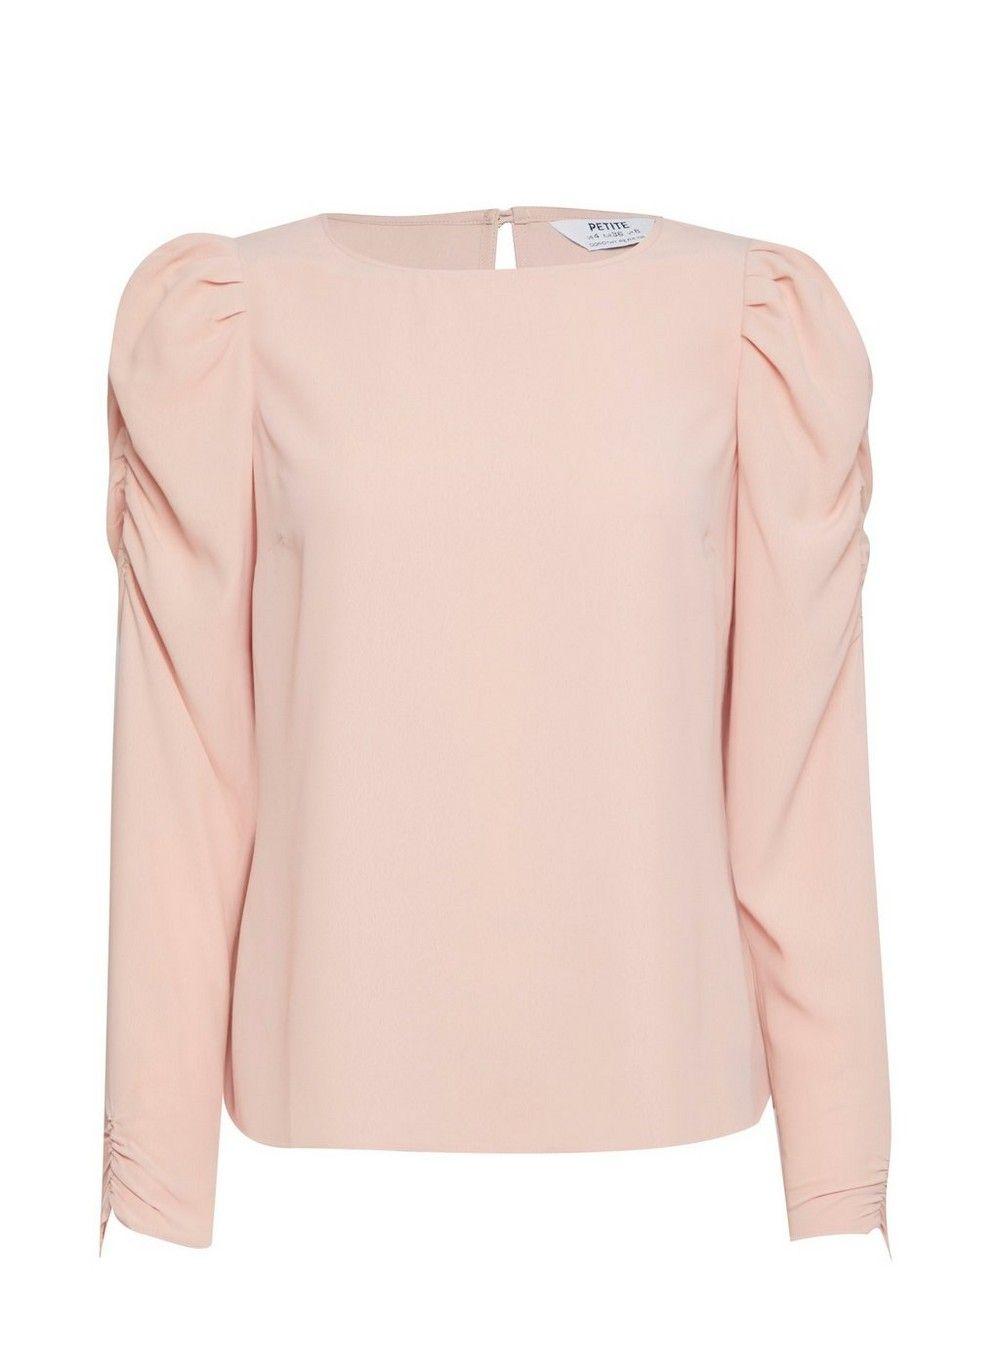 Dorothy Perkins Womens Petite Pink Long Sleeve Puff Shoulder Top Blouse